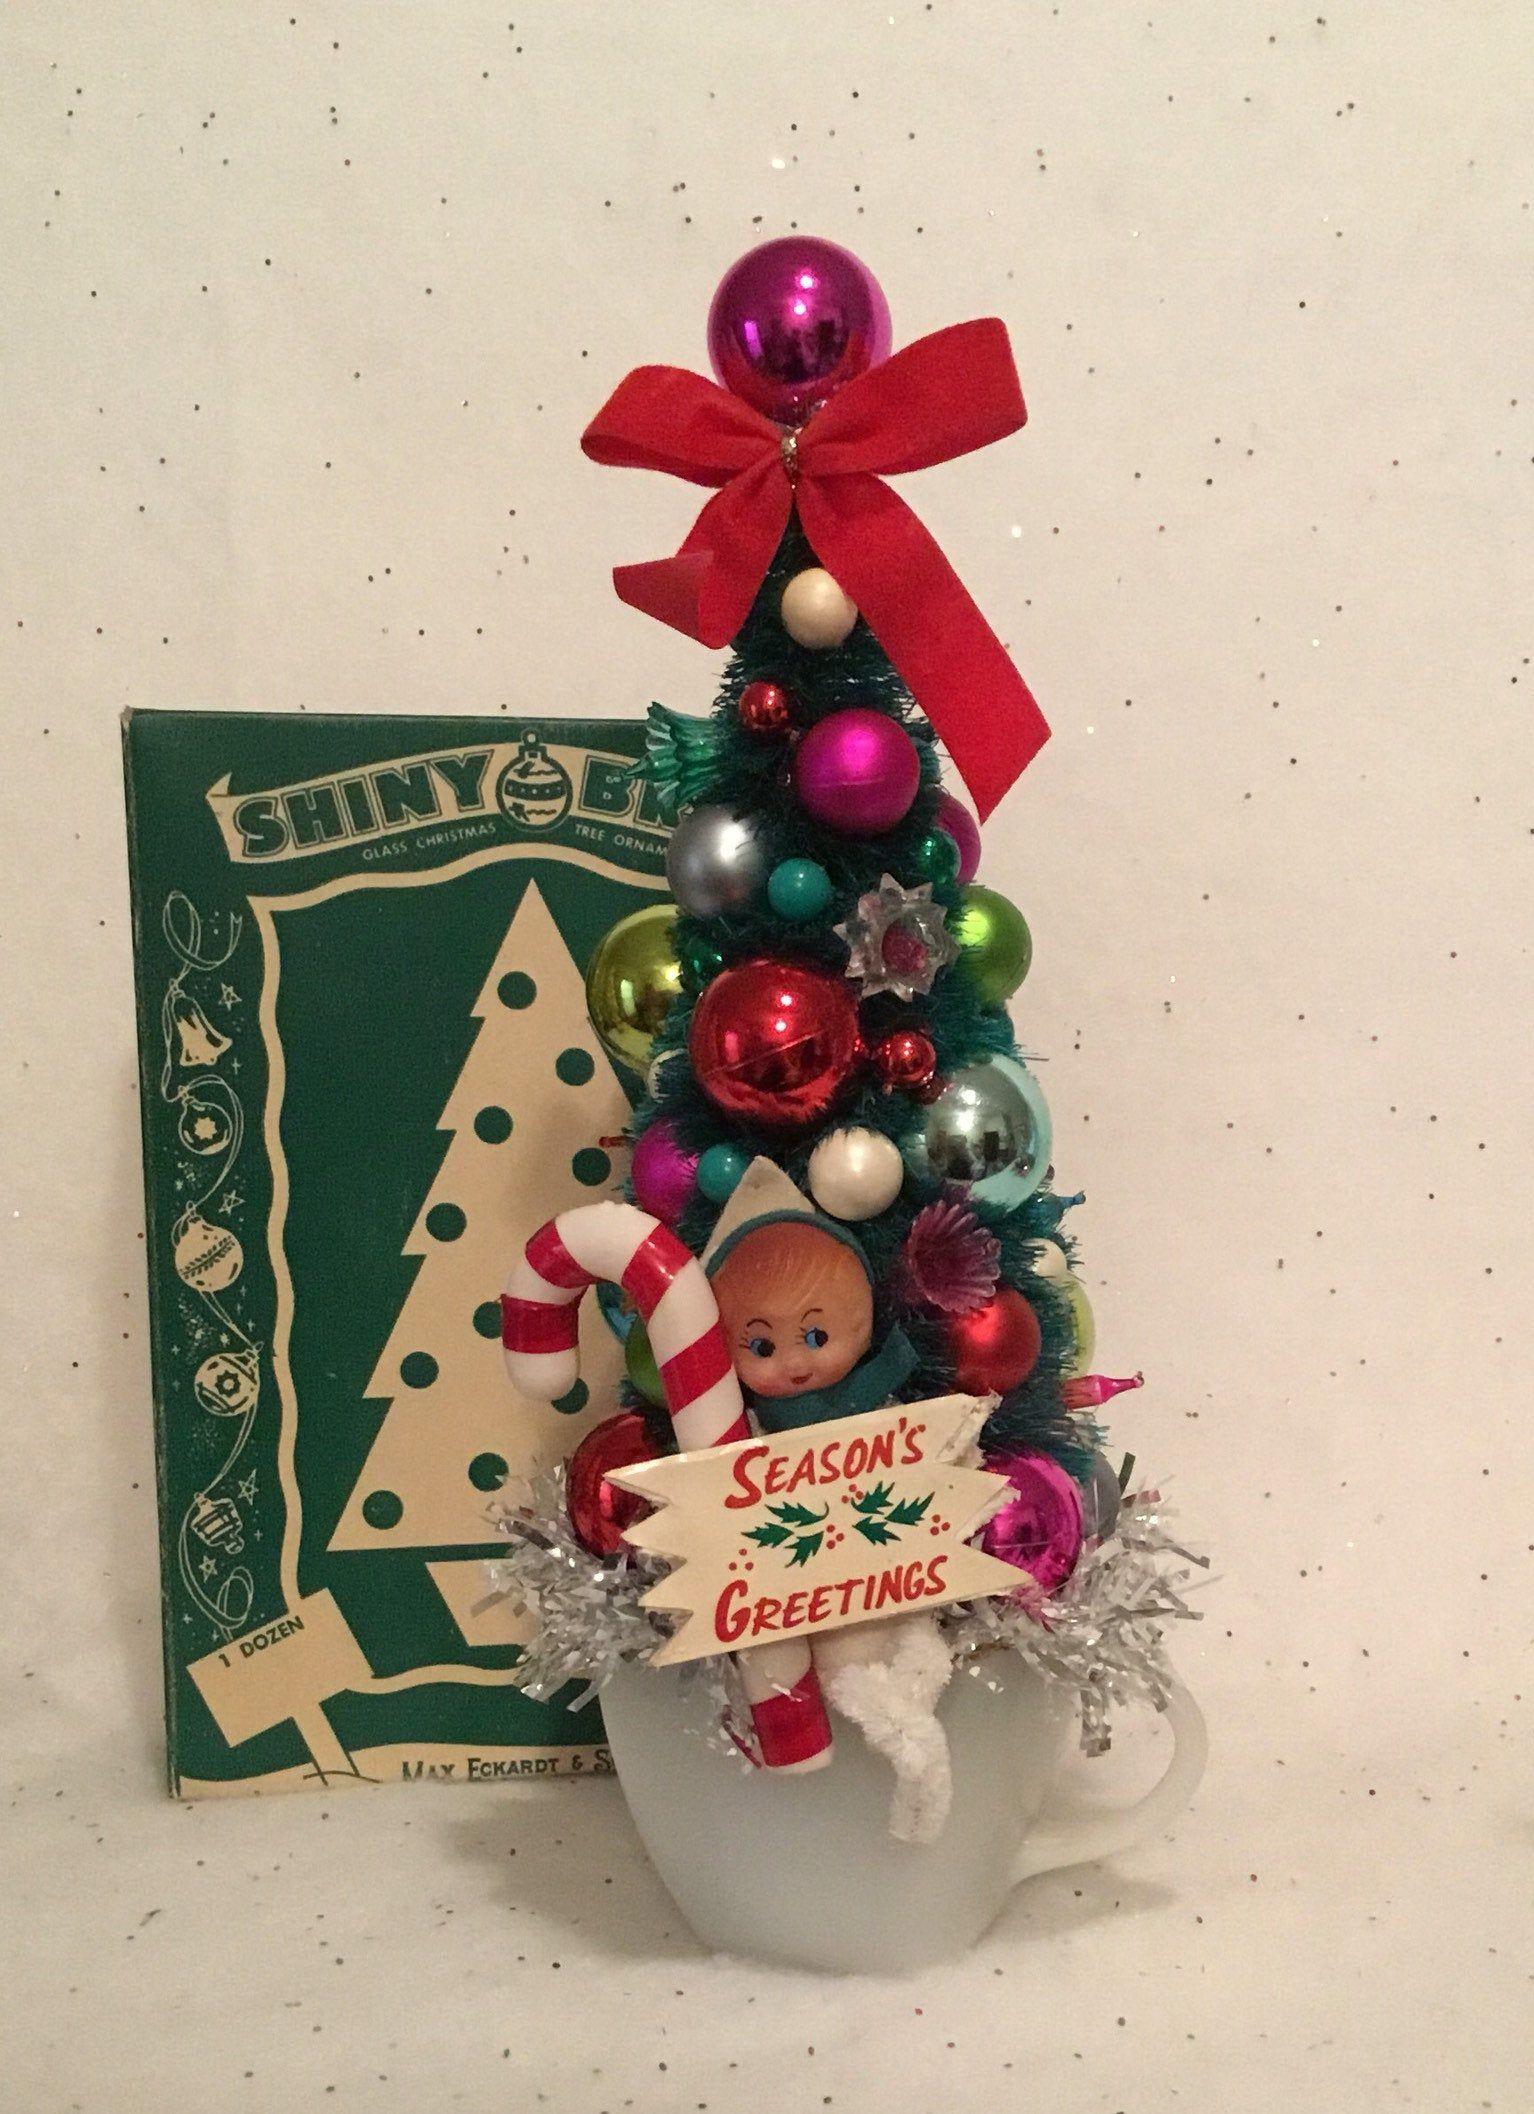 Christmas Elf Bottle Brush Tree Vintage Inspired Ornament Tree Holiday Tabletop Tree Decor Diy Christmas Ornaments Vintage Christmas Crafts Christmas Towels